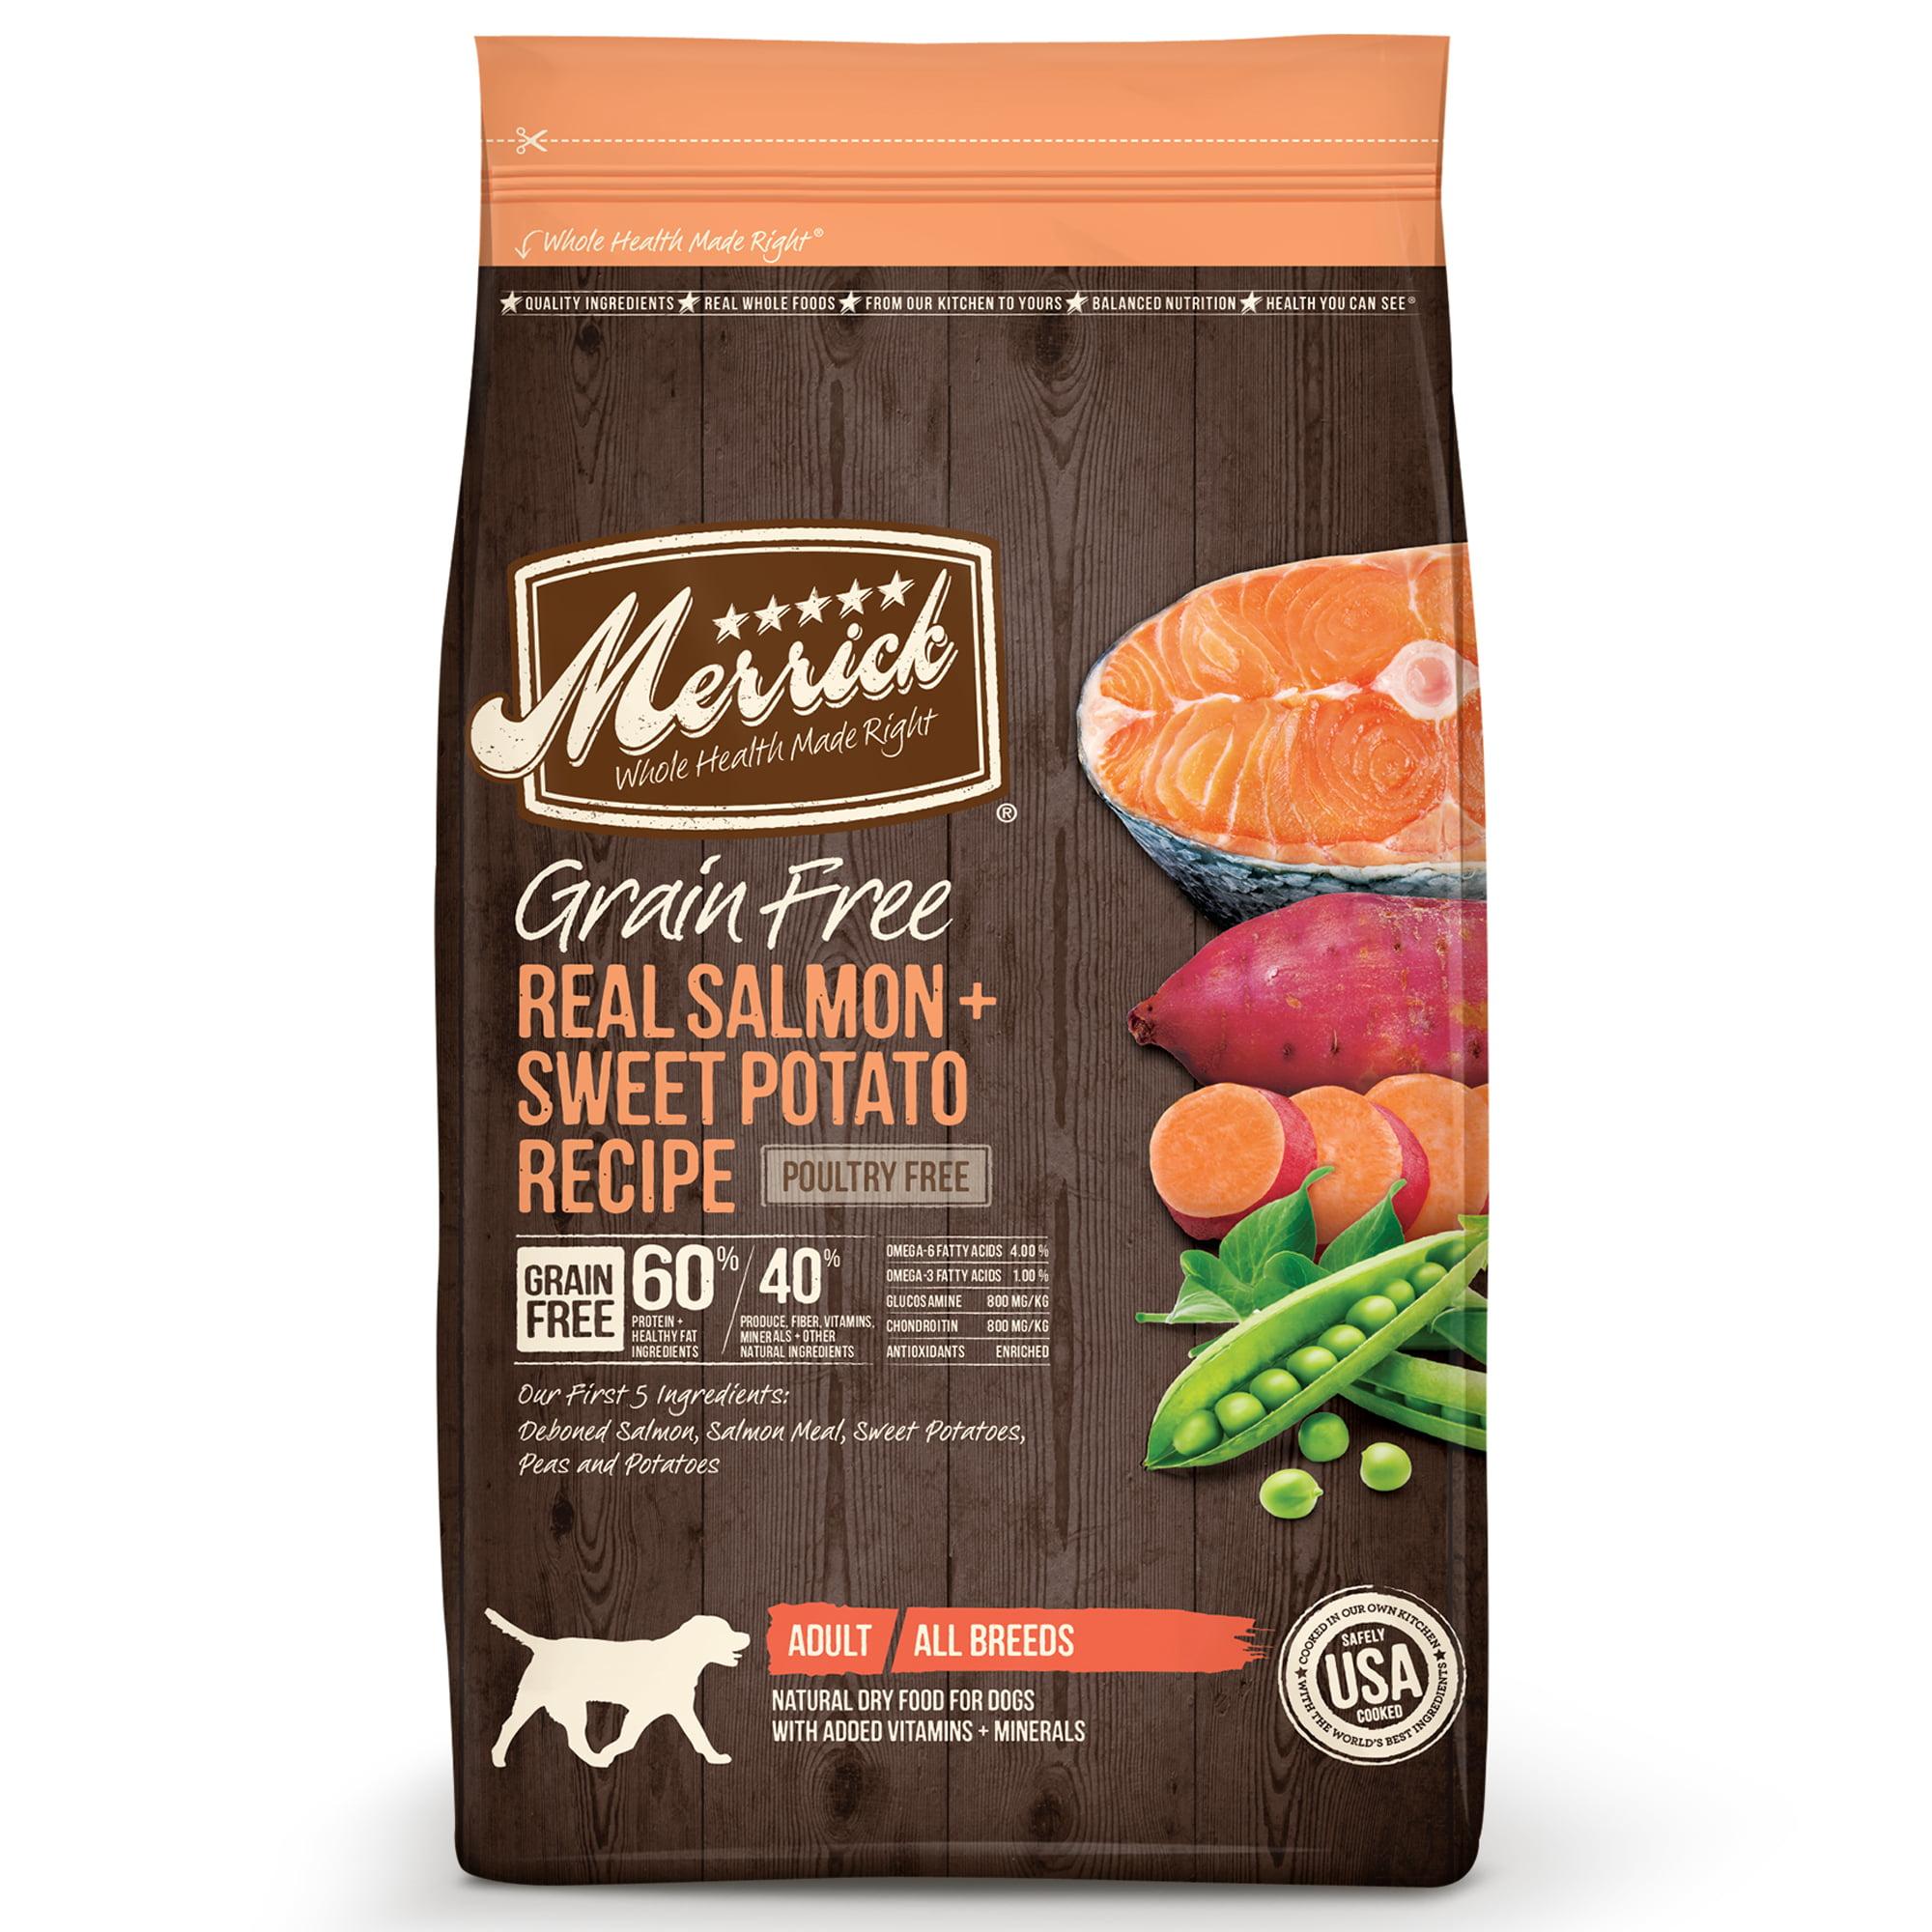 Merrick Grain-Free Real Salmon & Sweet Potato Recipe Dog Food, 25 Lb